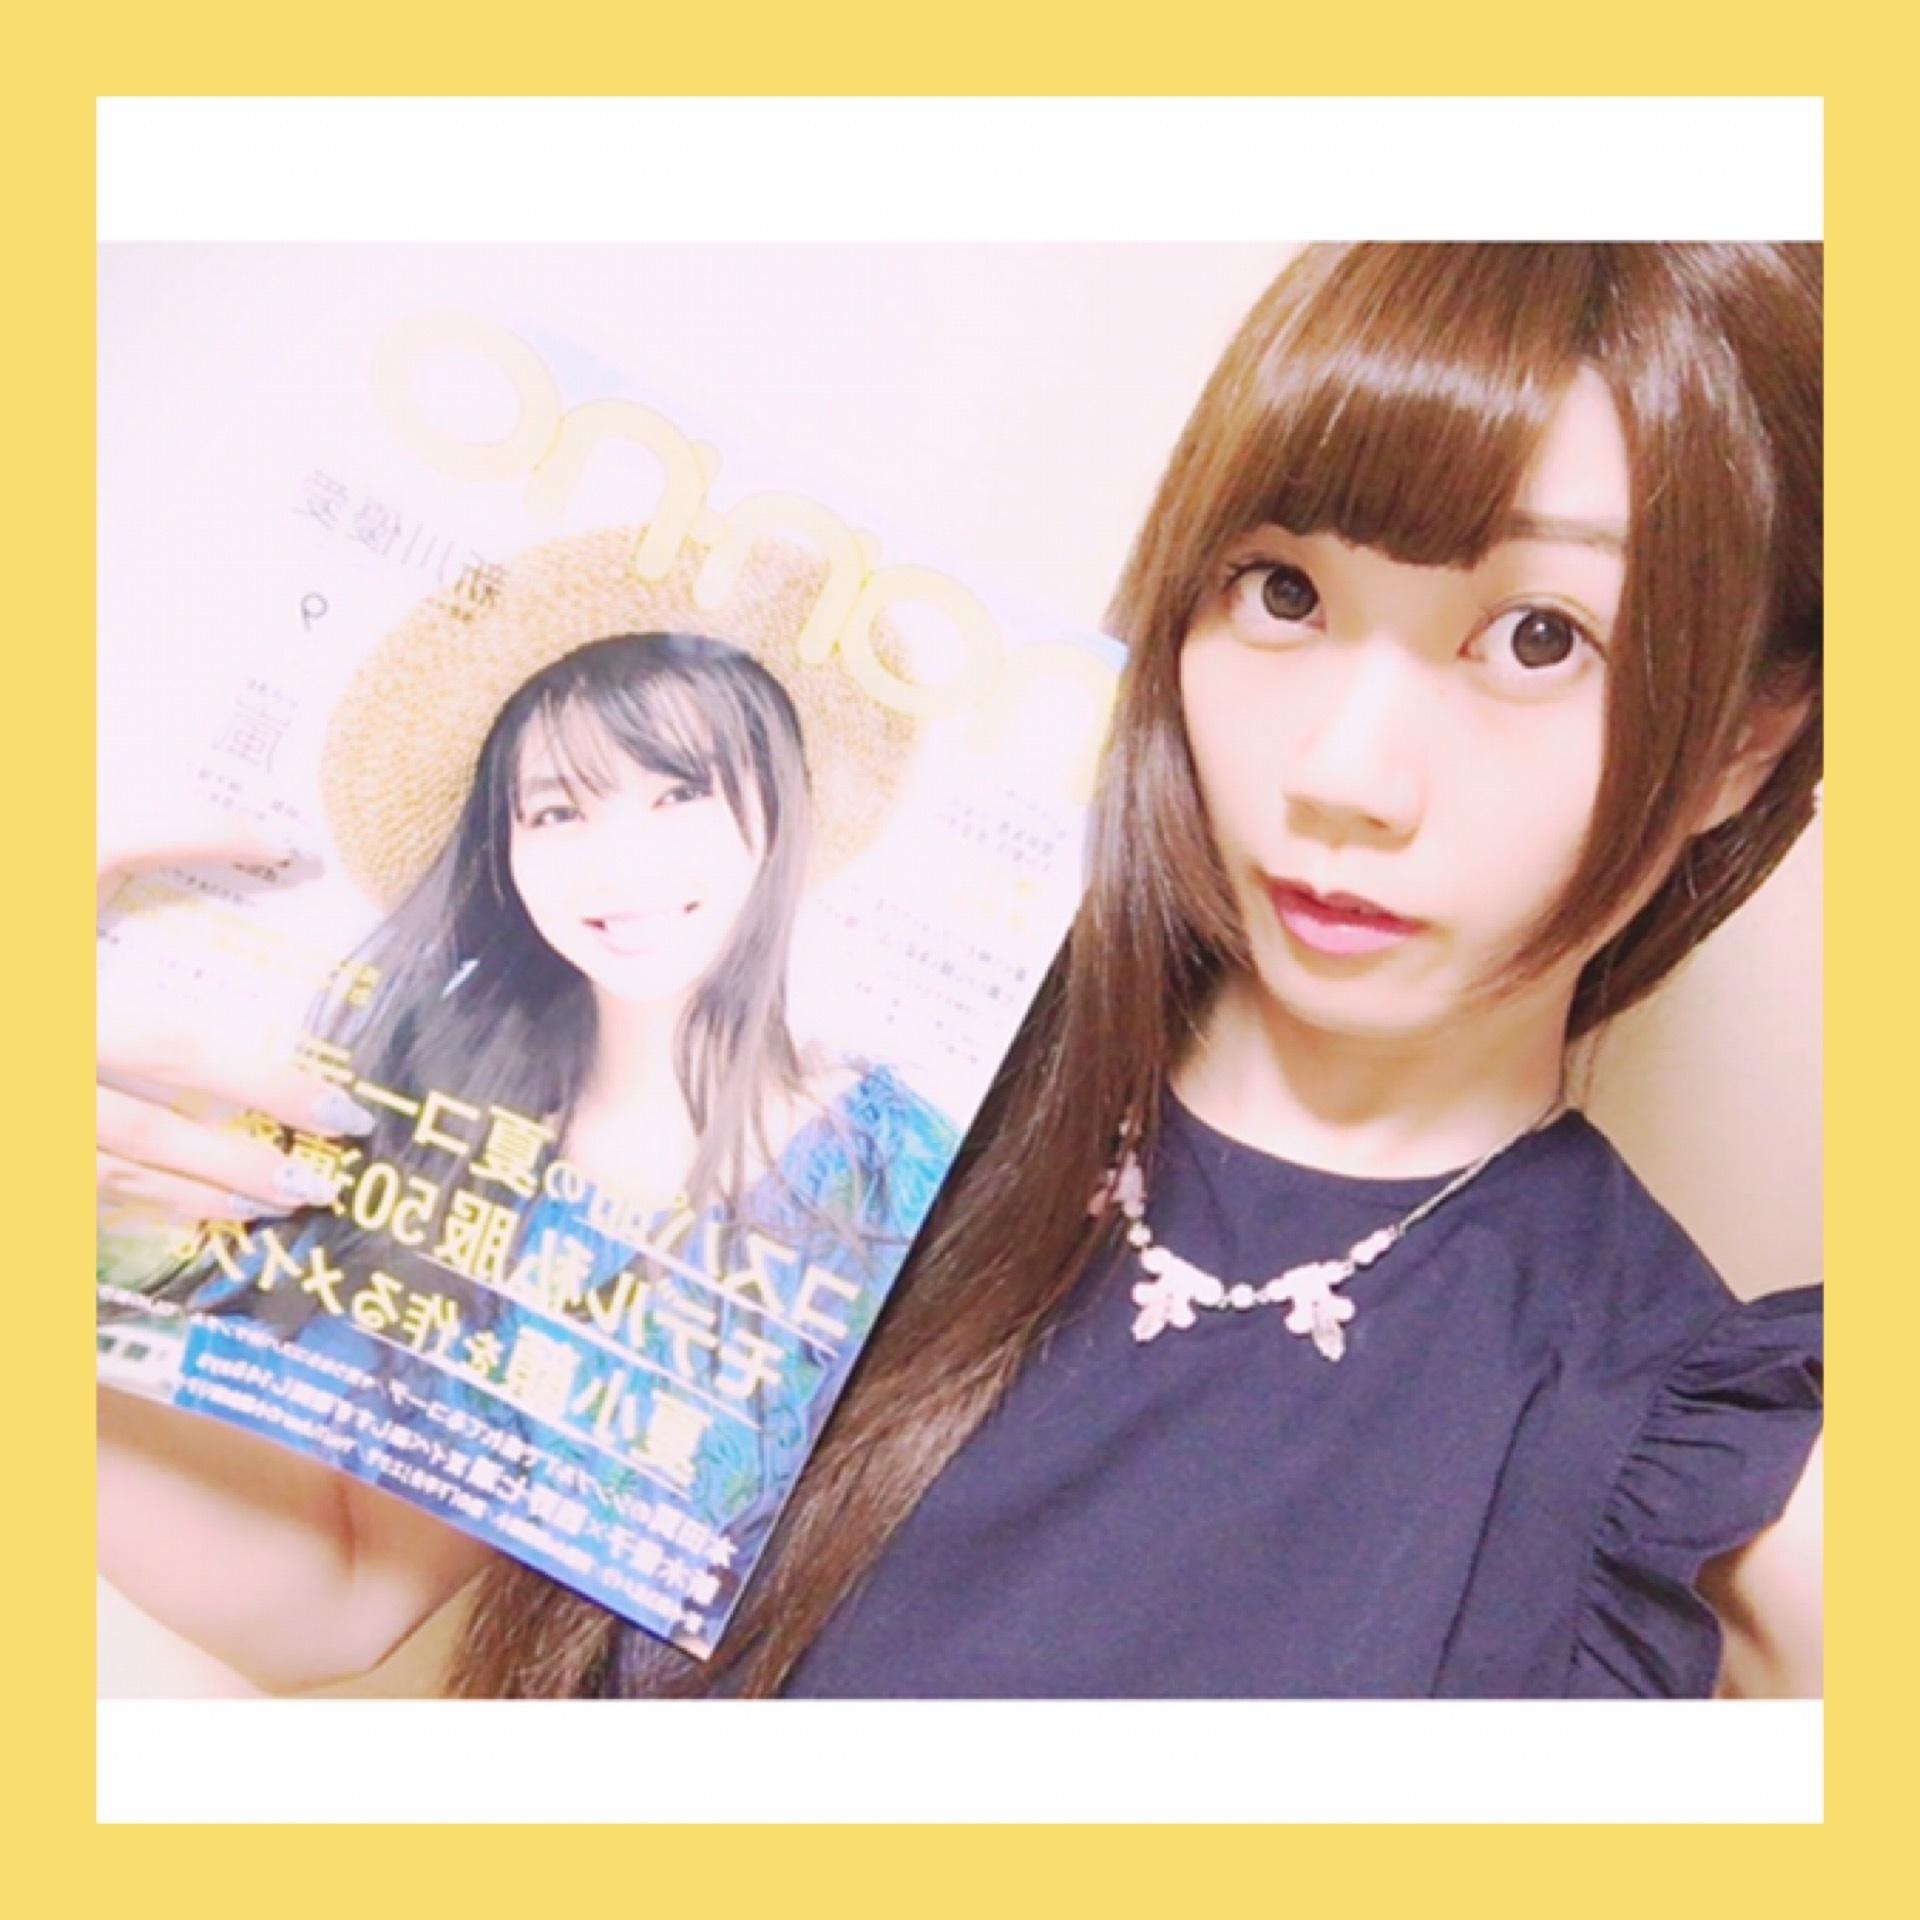 「 non-no 9月号 」発売中です!*॰¨̮_1_1